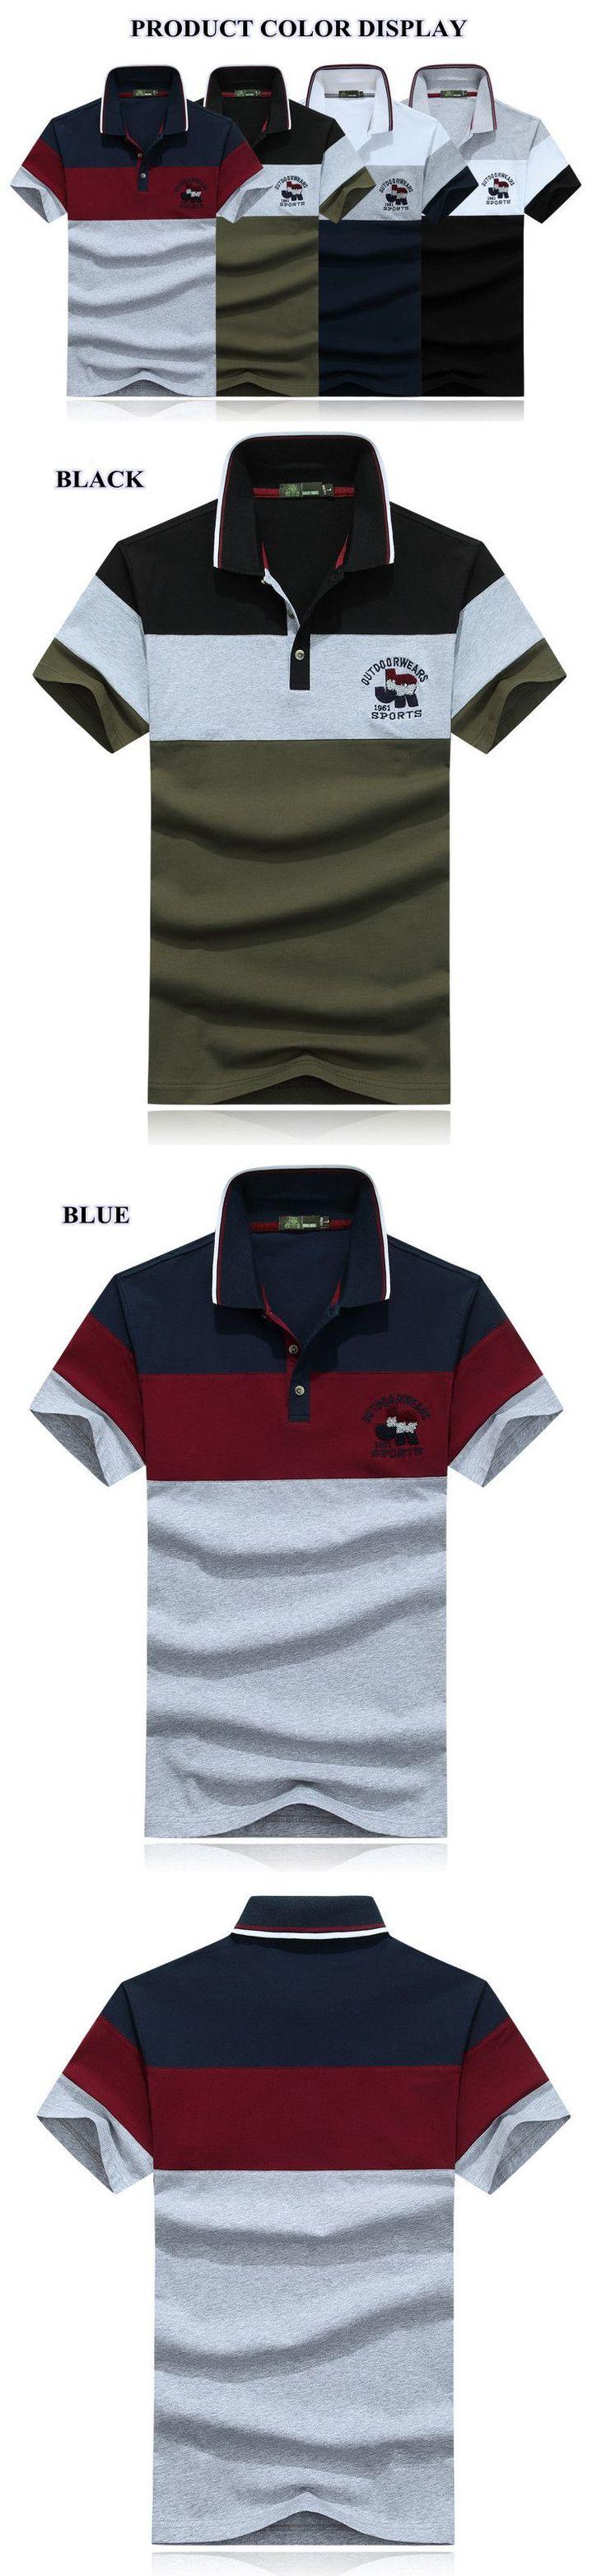 AFSJEEP Men's Fashion Striped Short Sleeve T-shirt Casual Splicing Color POLO Shirt